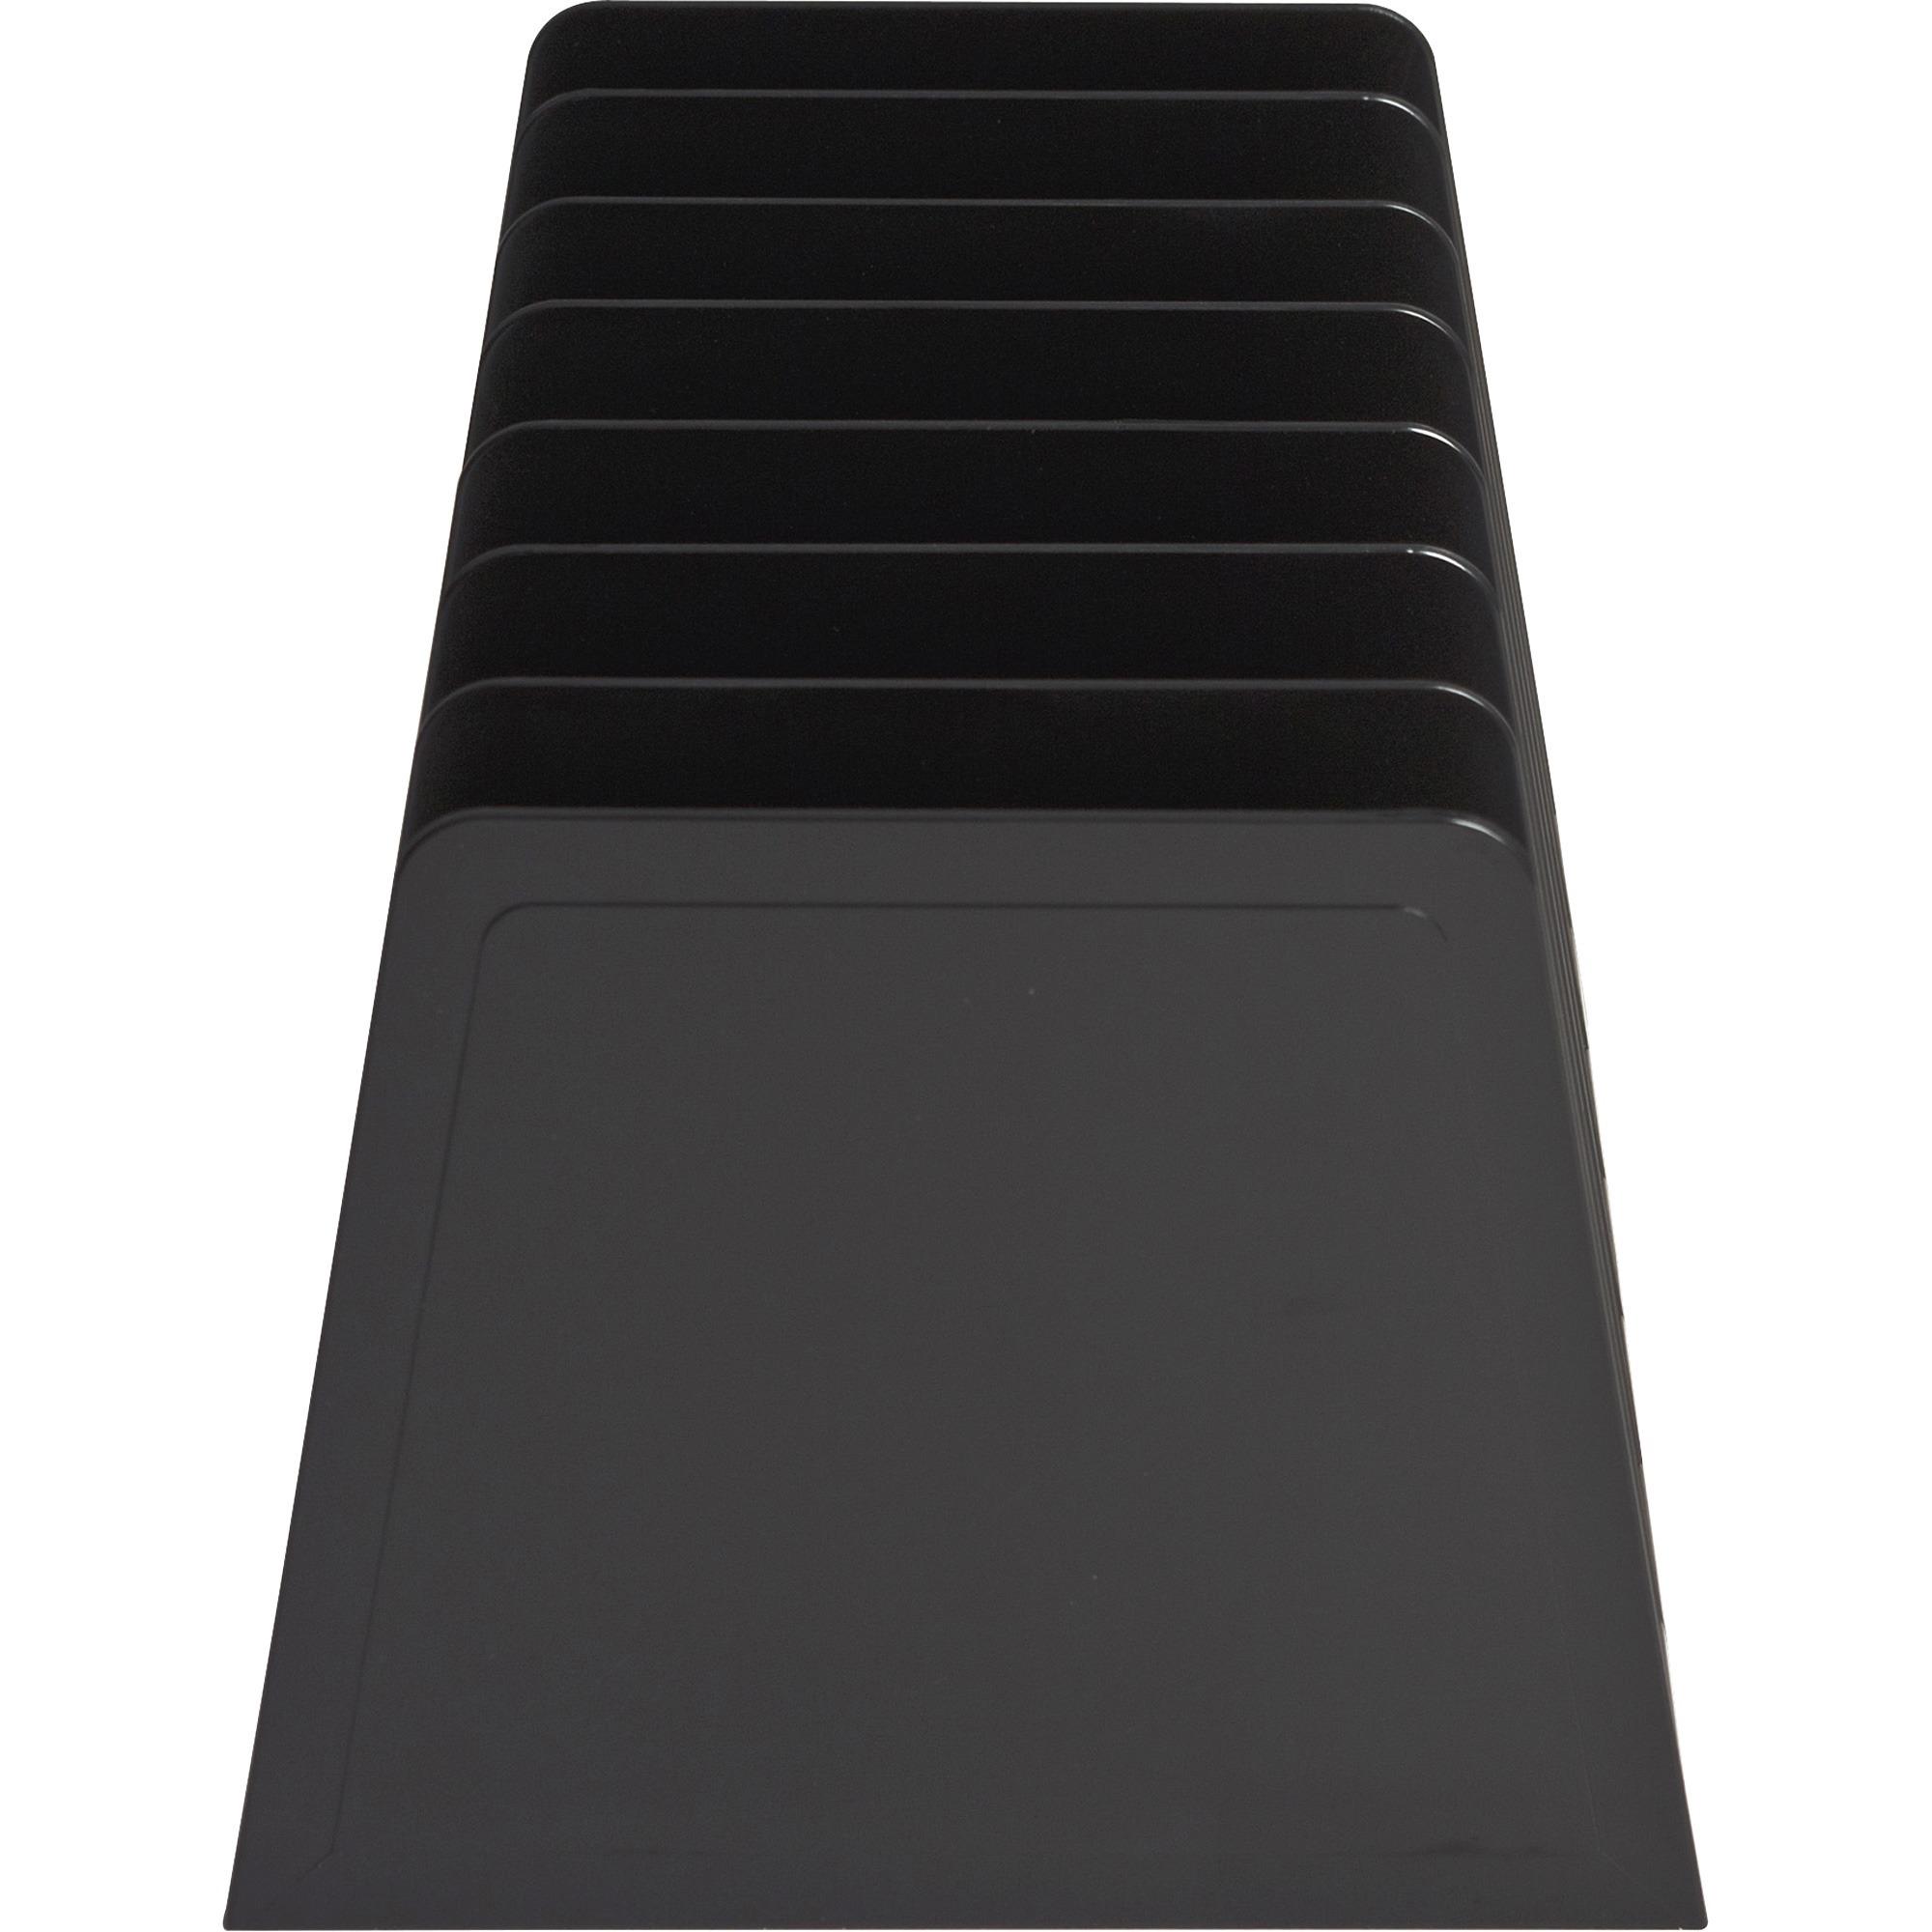 Sparco 7slot Desk Sorter